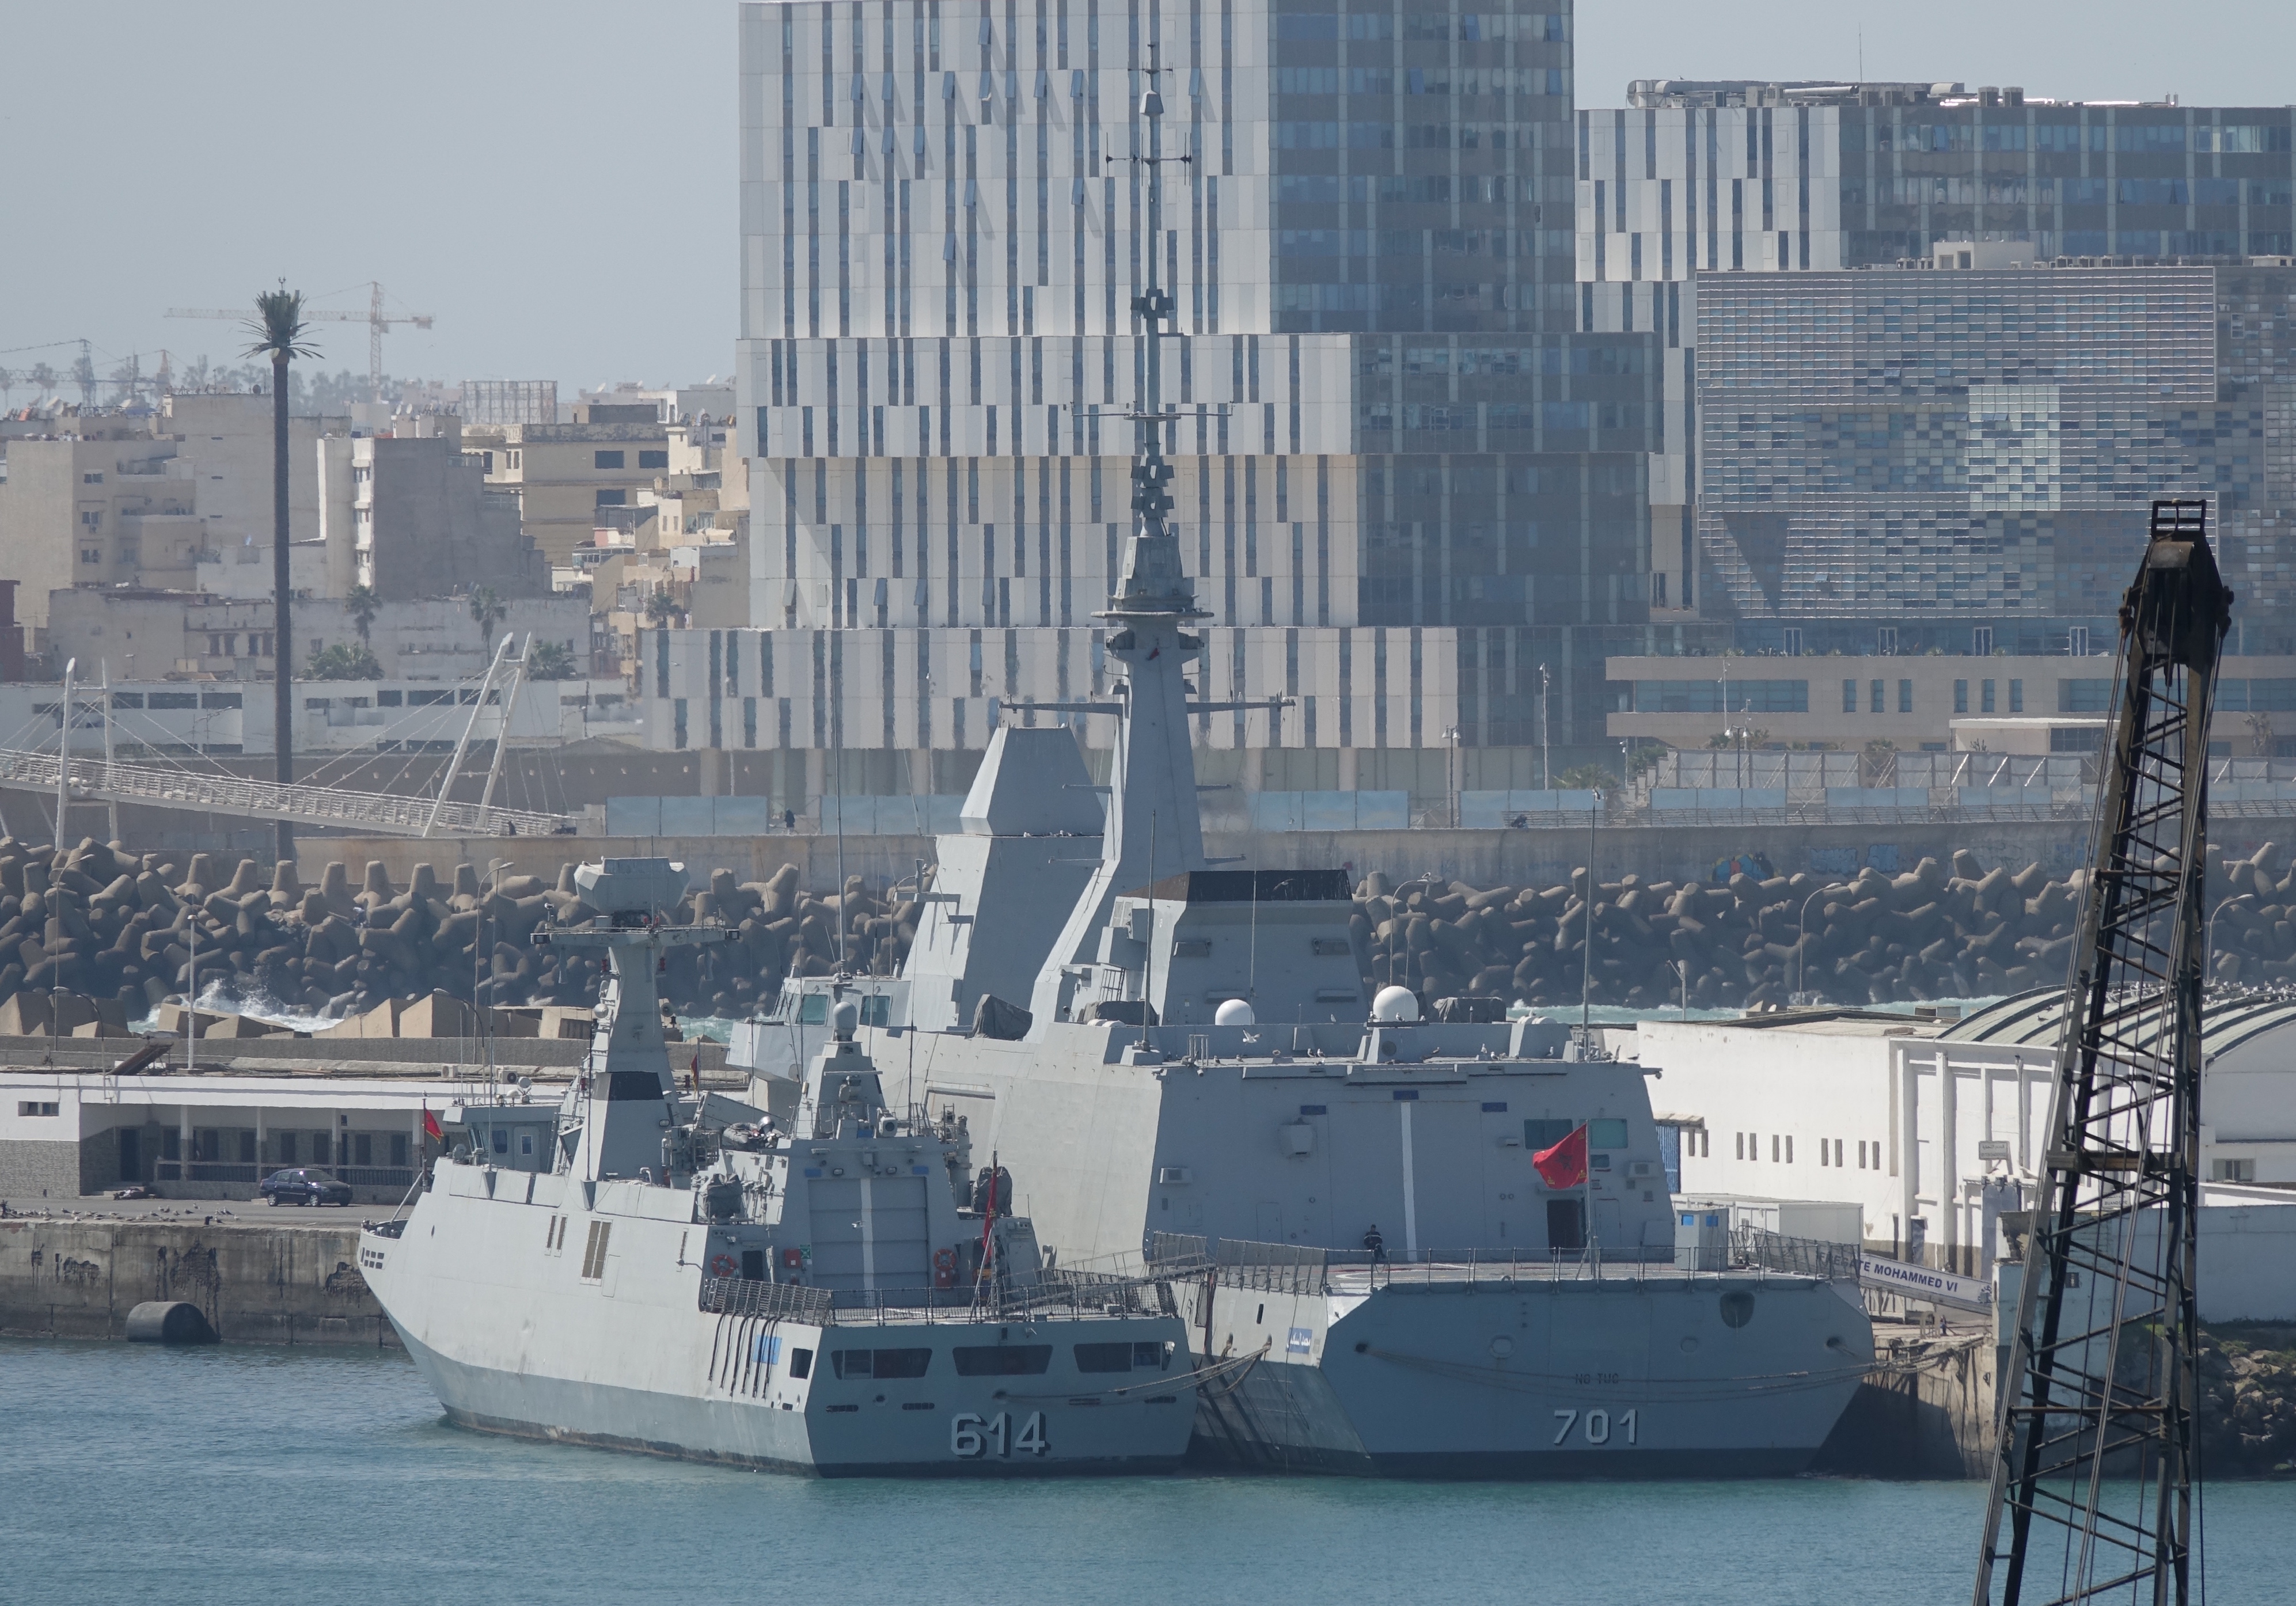 Royal Moroccan Navy FREMM Frigate / FREMM Marocaine - Mohammed VI - Page 13 3007857